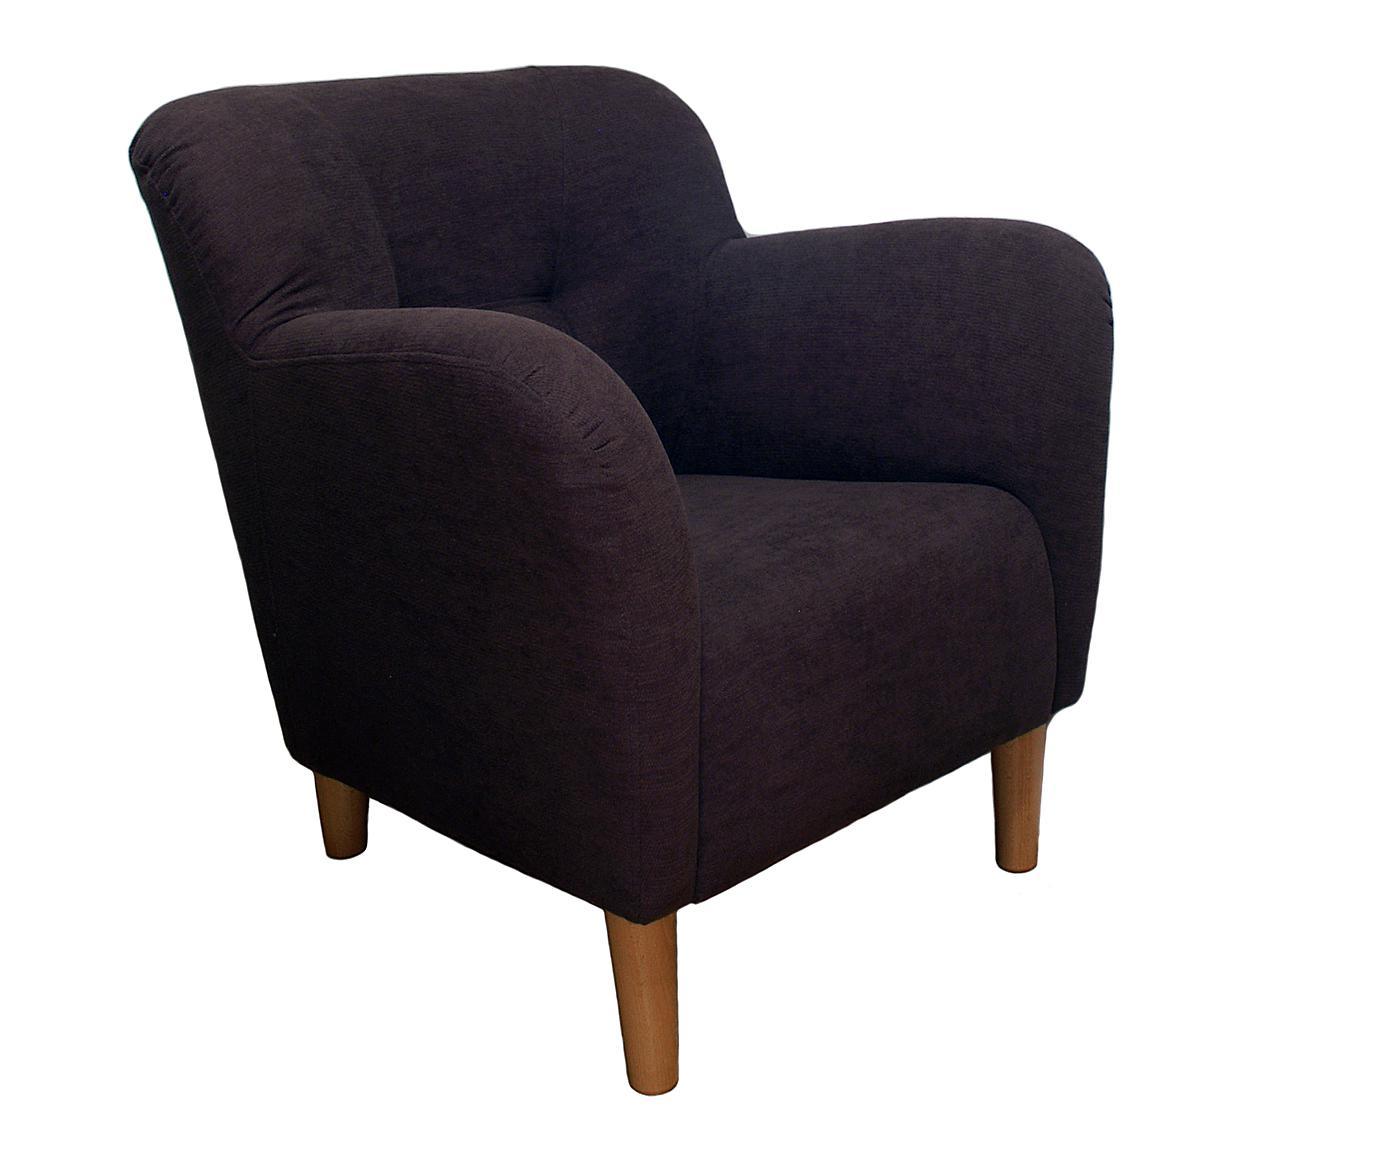 Tapizado de todo tipo de muebles